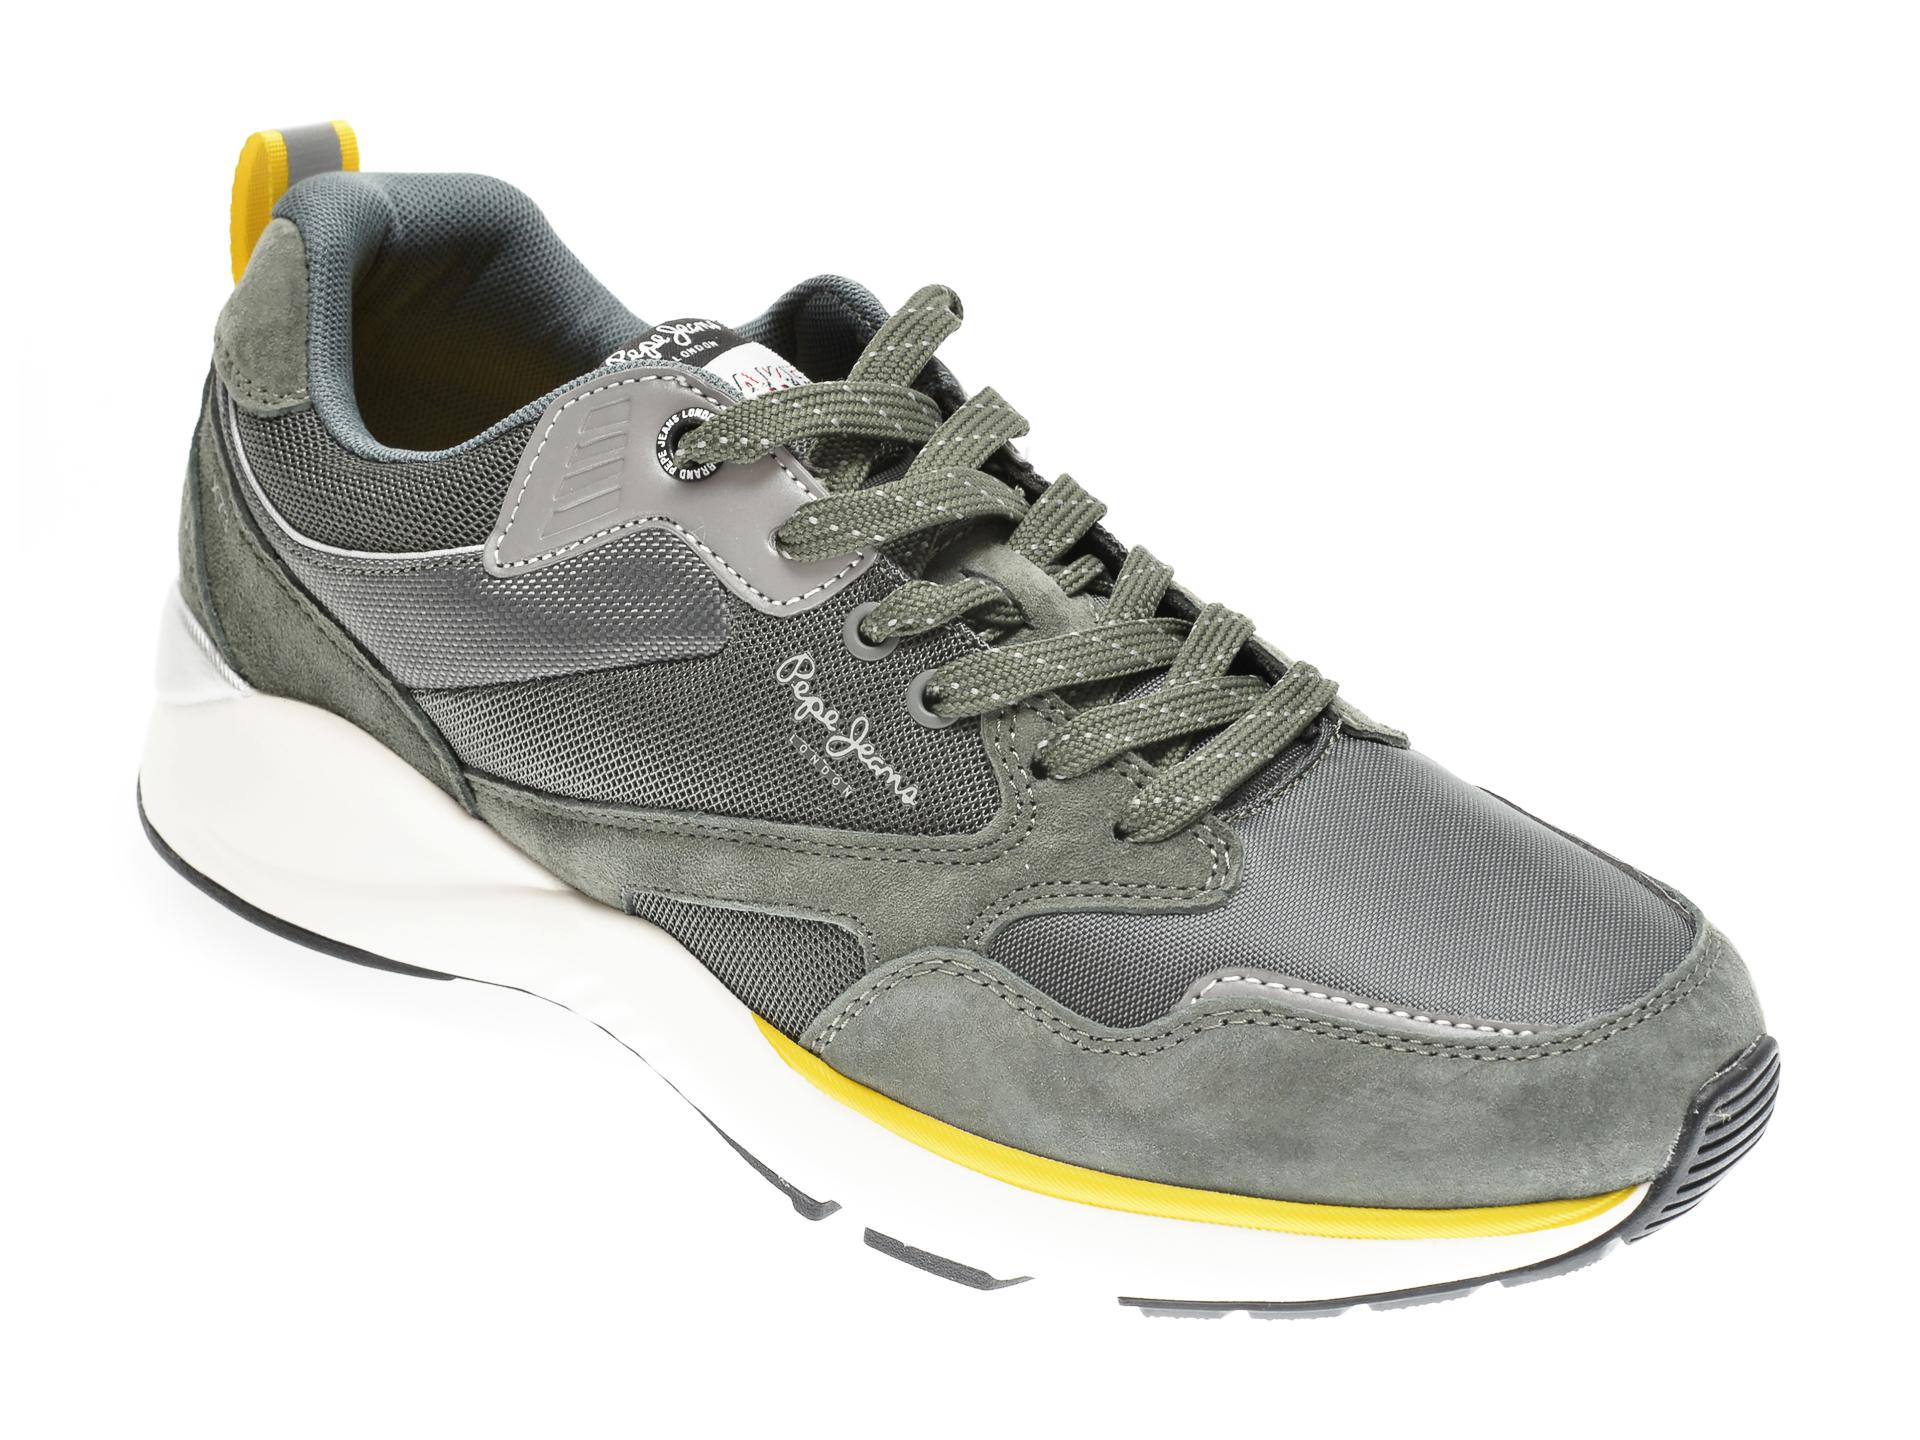 Pantofi sport PEPE JEANS kaki, MS30664, din material textil si piele intoarsa